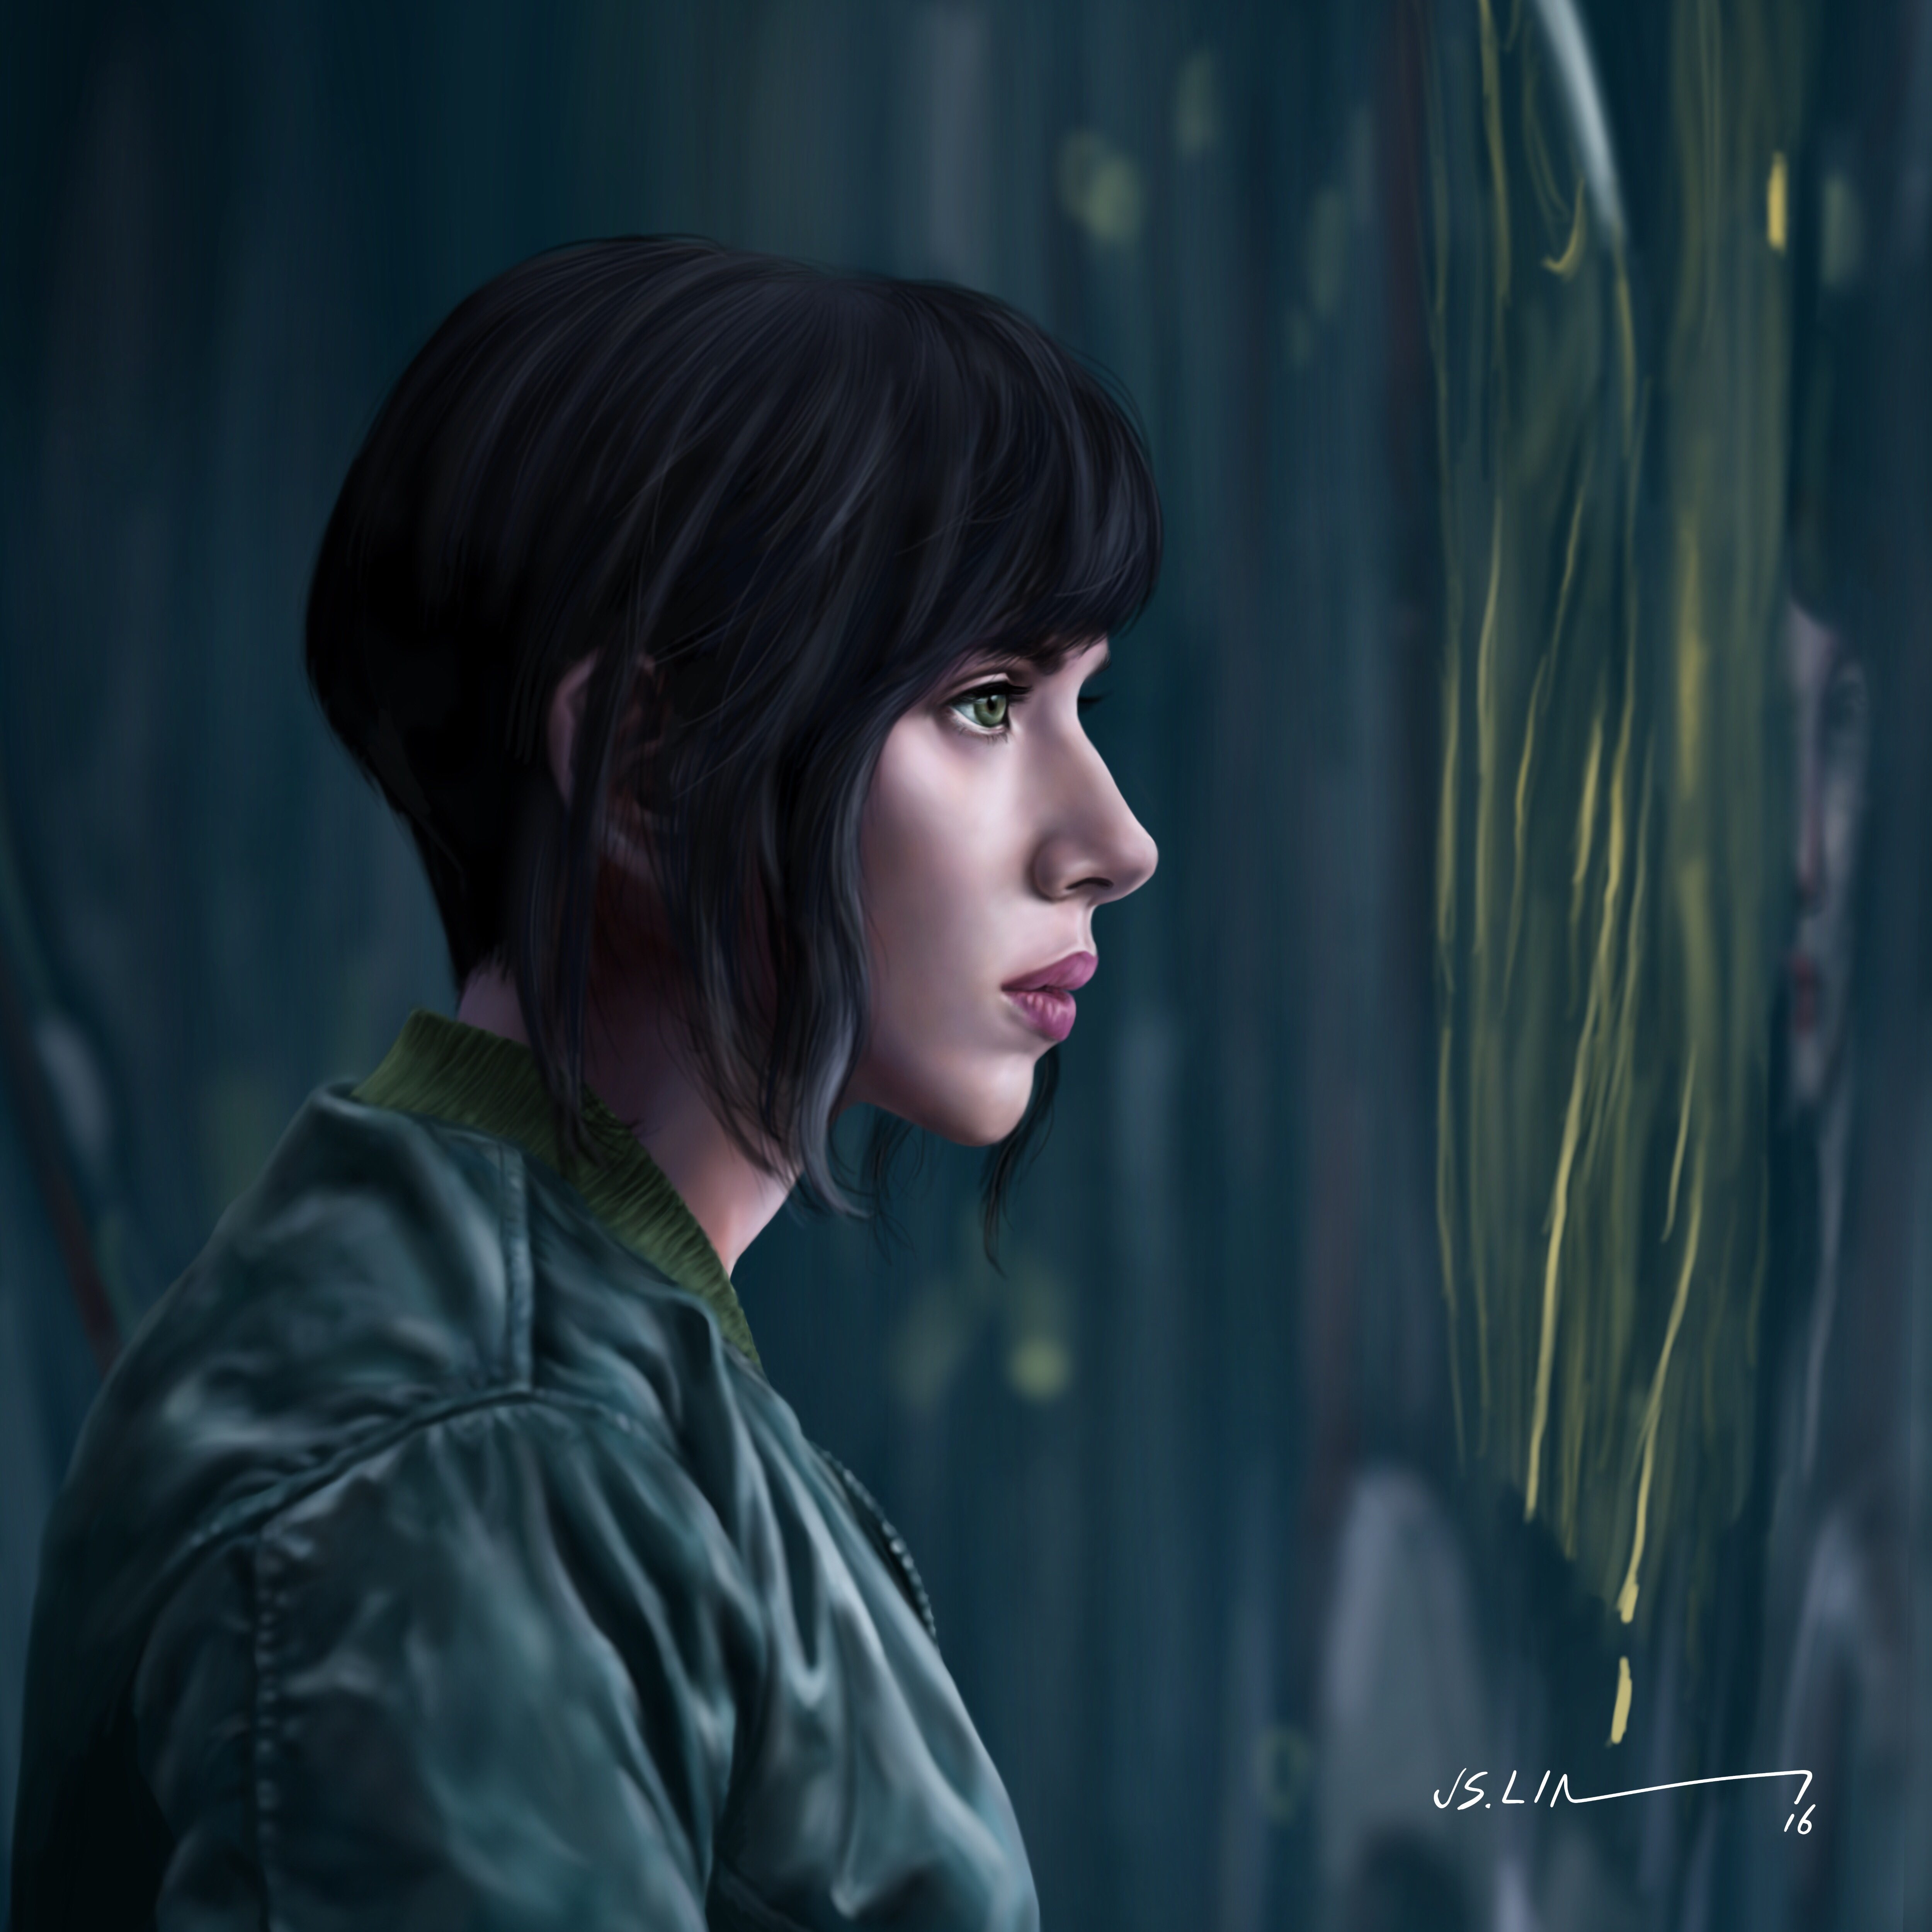 Scarlett Johansson Artwork Ghost In The Shell Hd Movies 4k